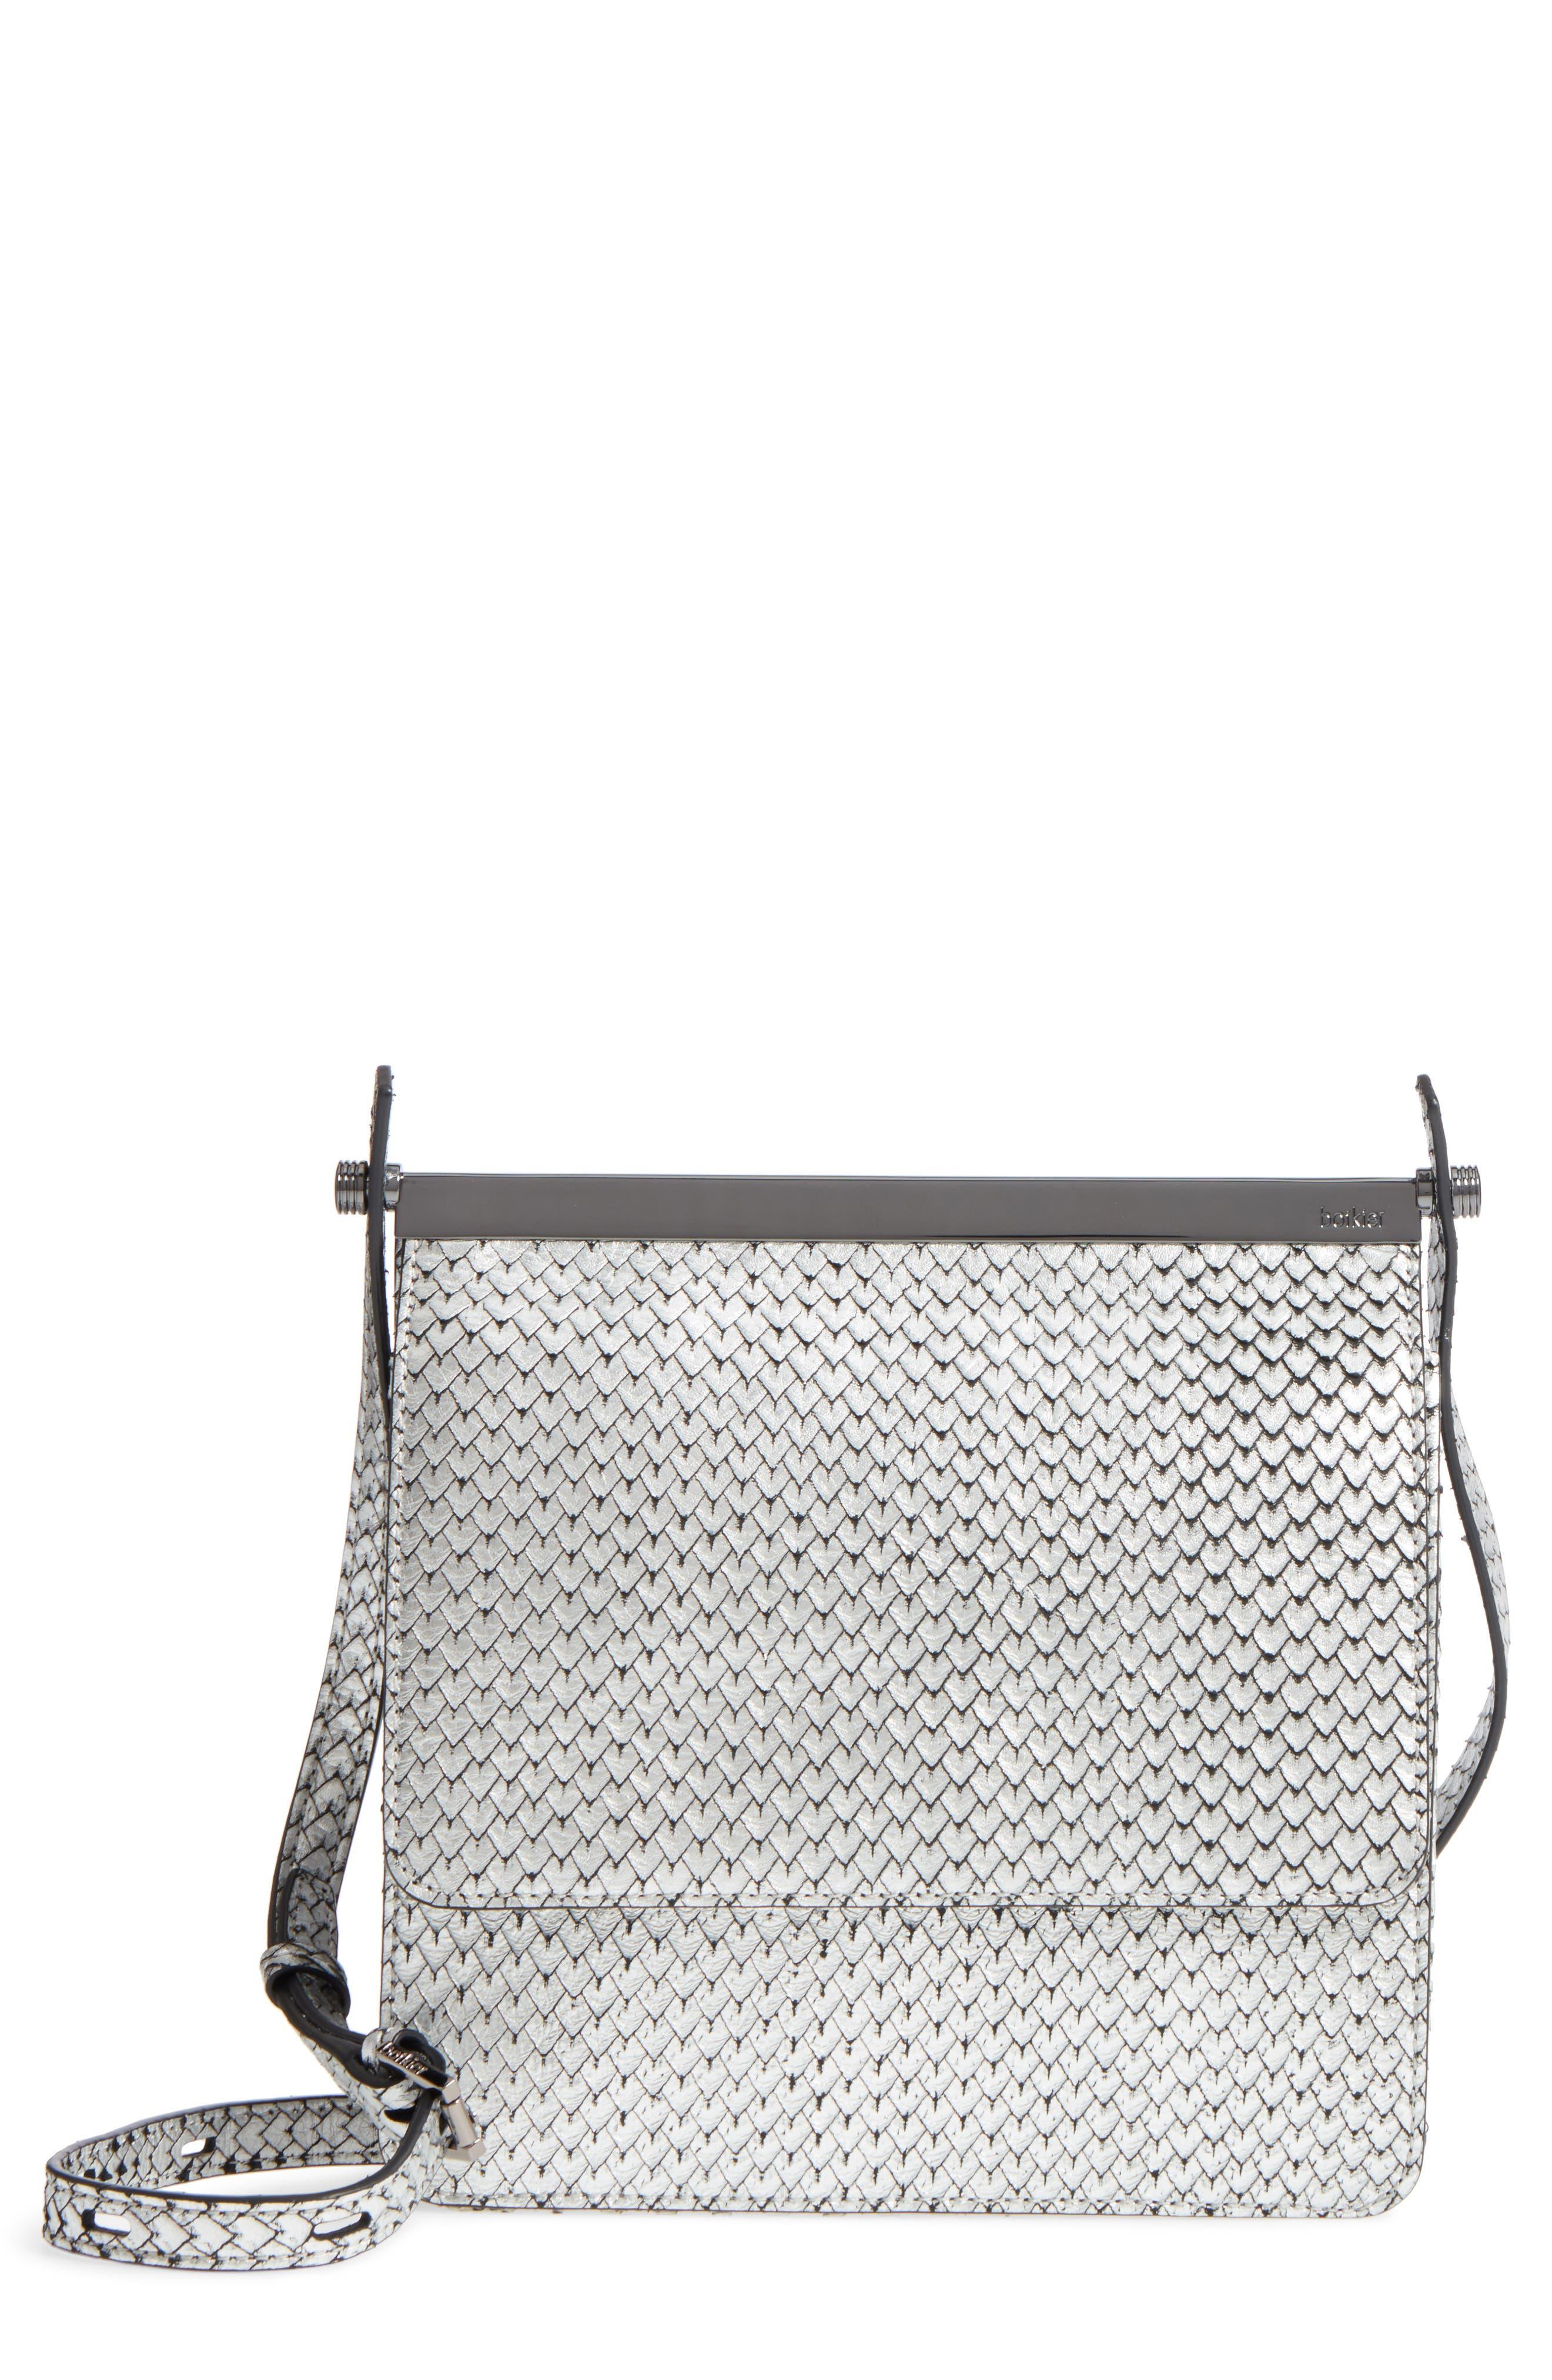 Alternate Image 1 Selected - Botkier Crawford Calfskin Leather Crossbody Bag